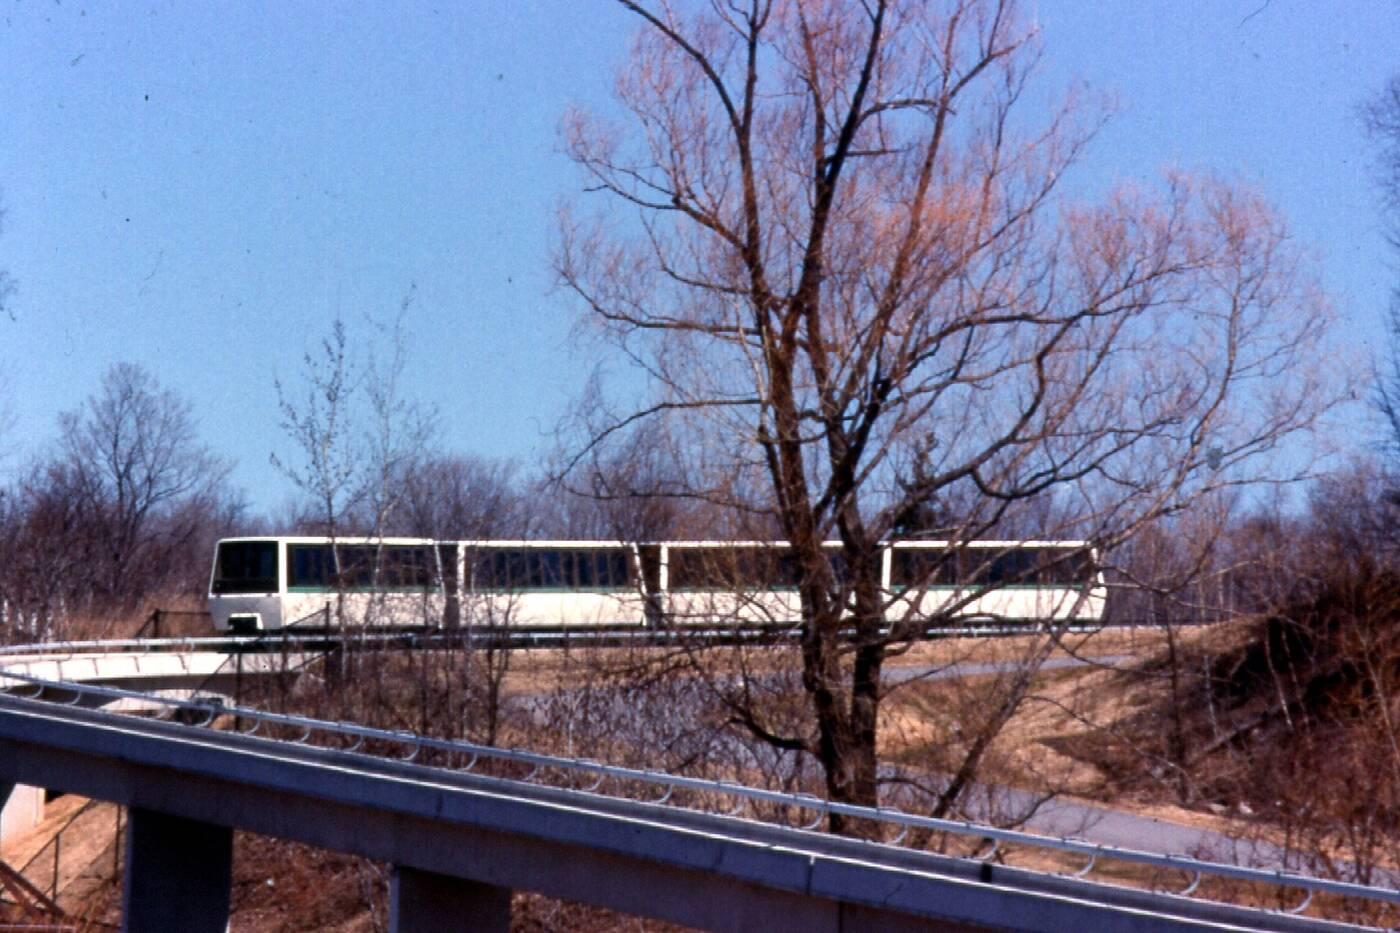 toronto Zoo Monorail